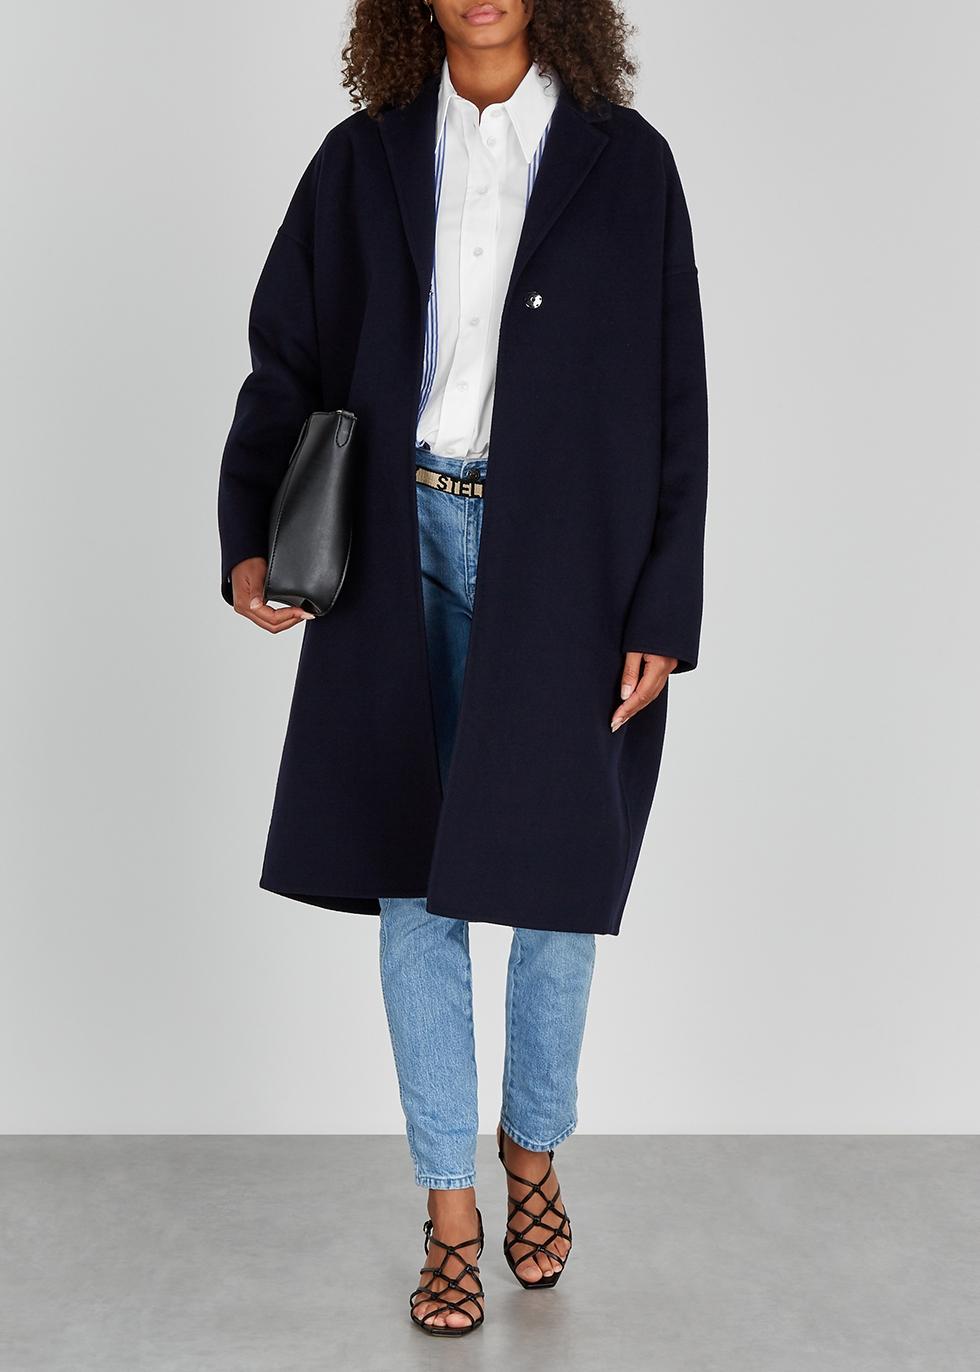 Navy Blue High Collar Winter Coat